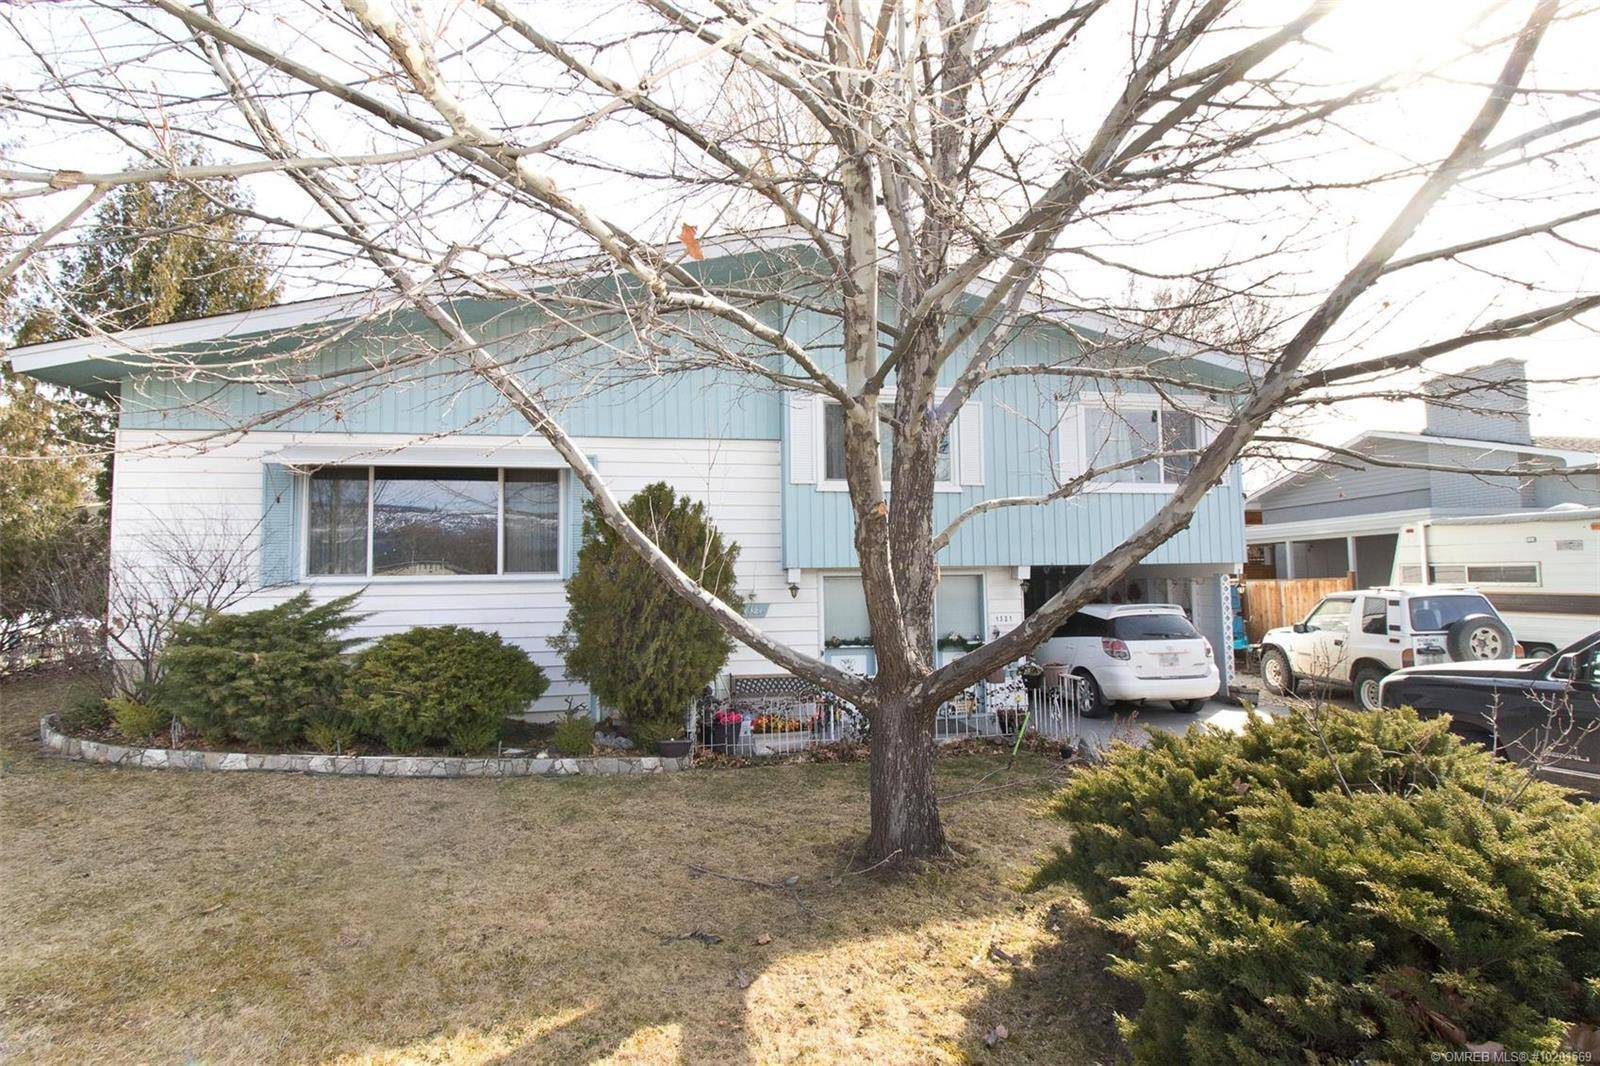 House for sale at 1321 Flemish St Kelowna British Columbia - MLS: 10201569